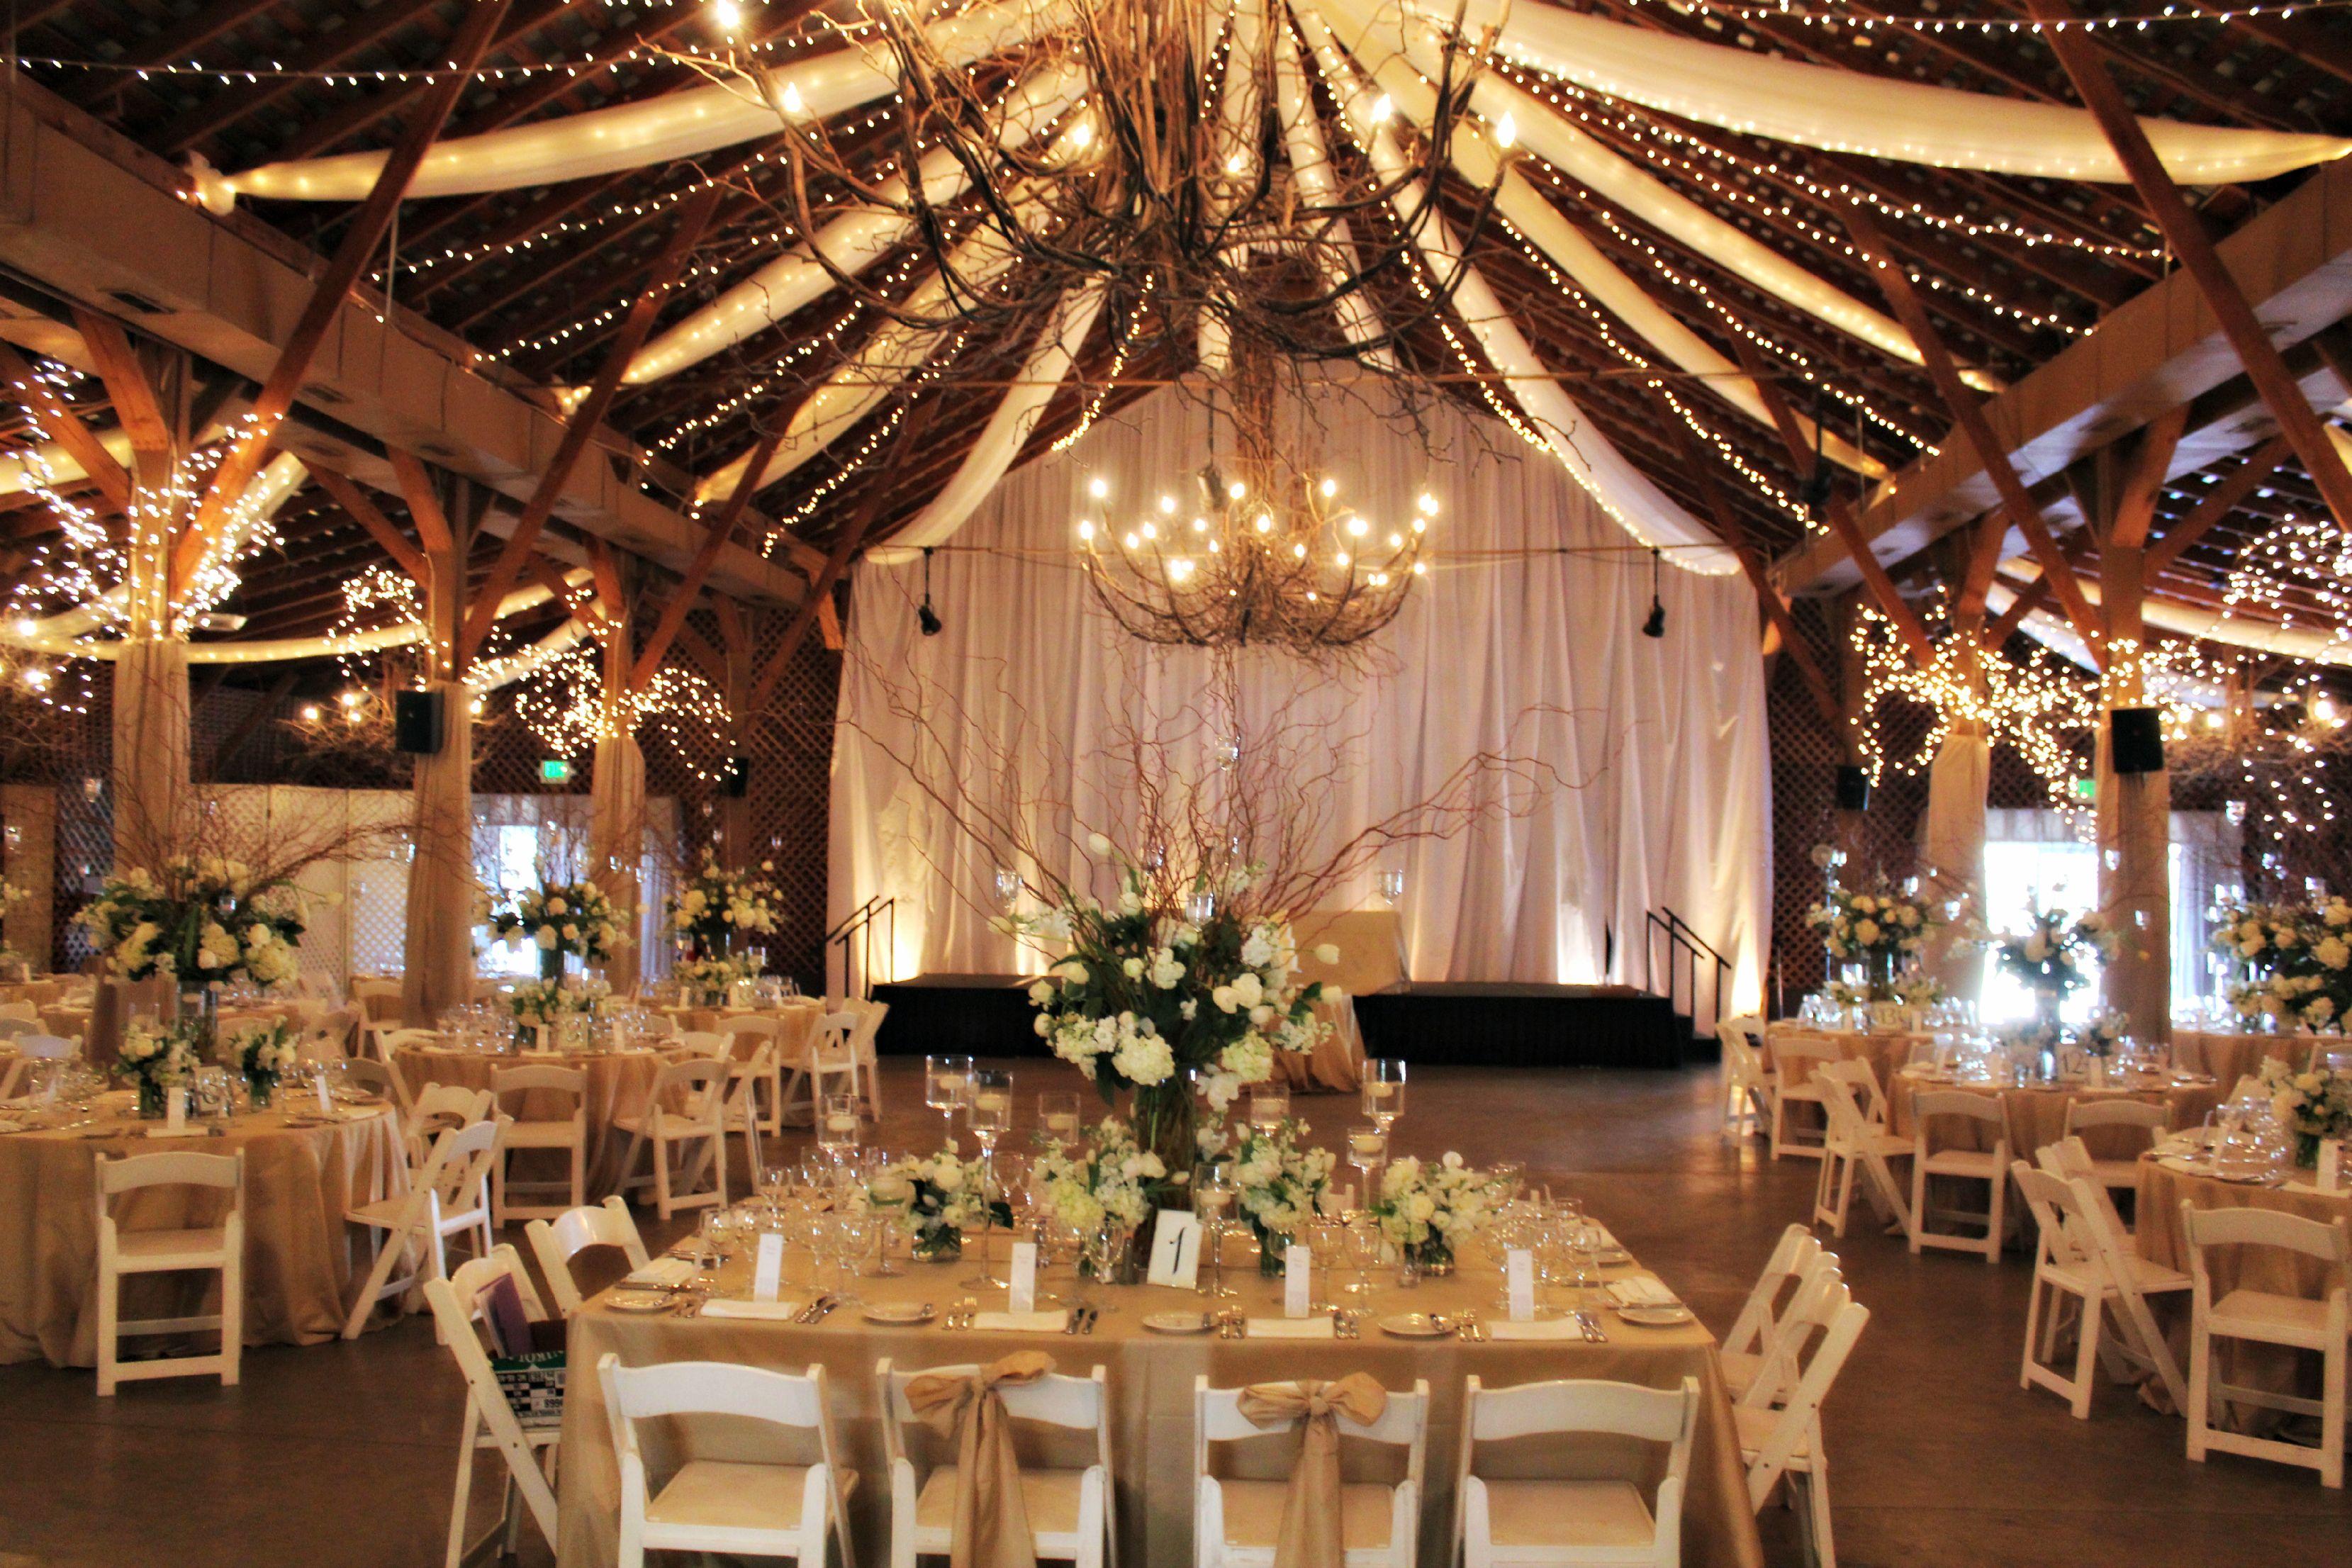 Wedding Reception At The Barn Fearrington Village In Pittsboro Nc